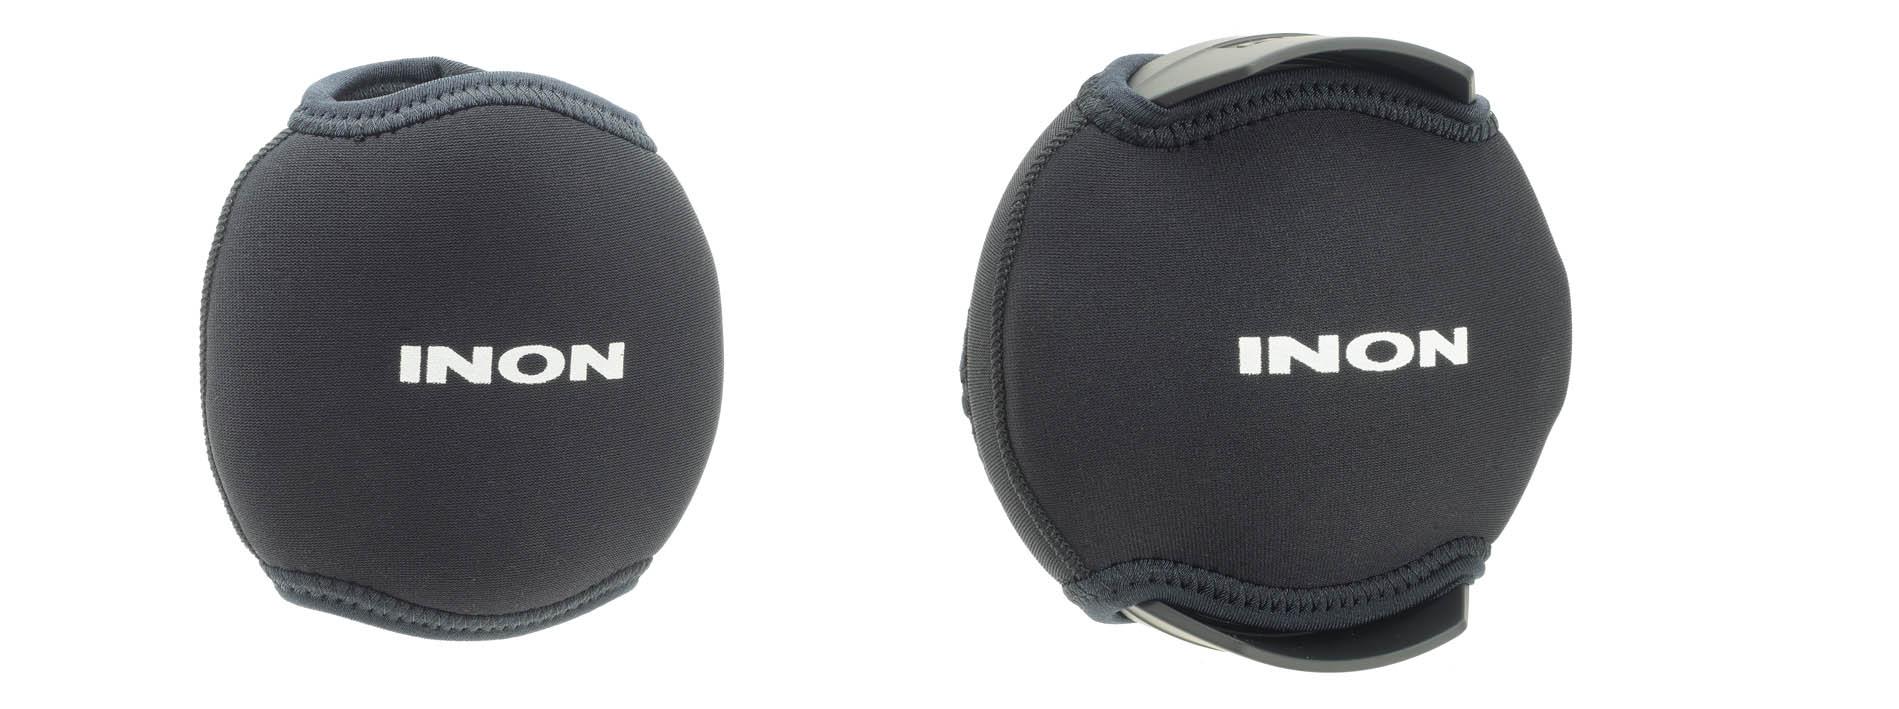 INON ドームカバーS 新発売 ドームポートEP01 / EP02 for Olympus対応用